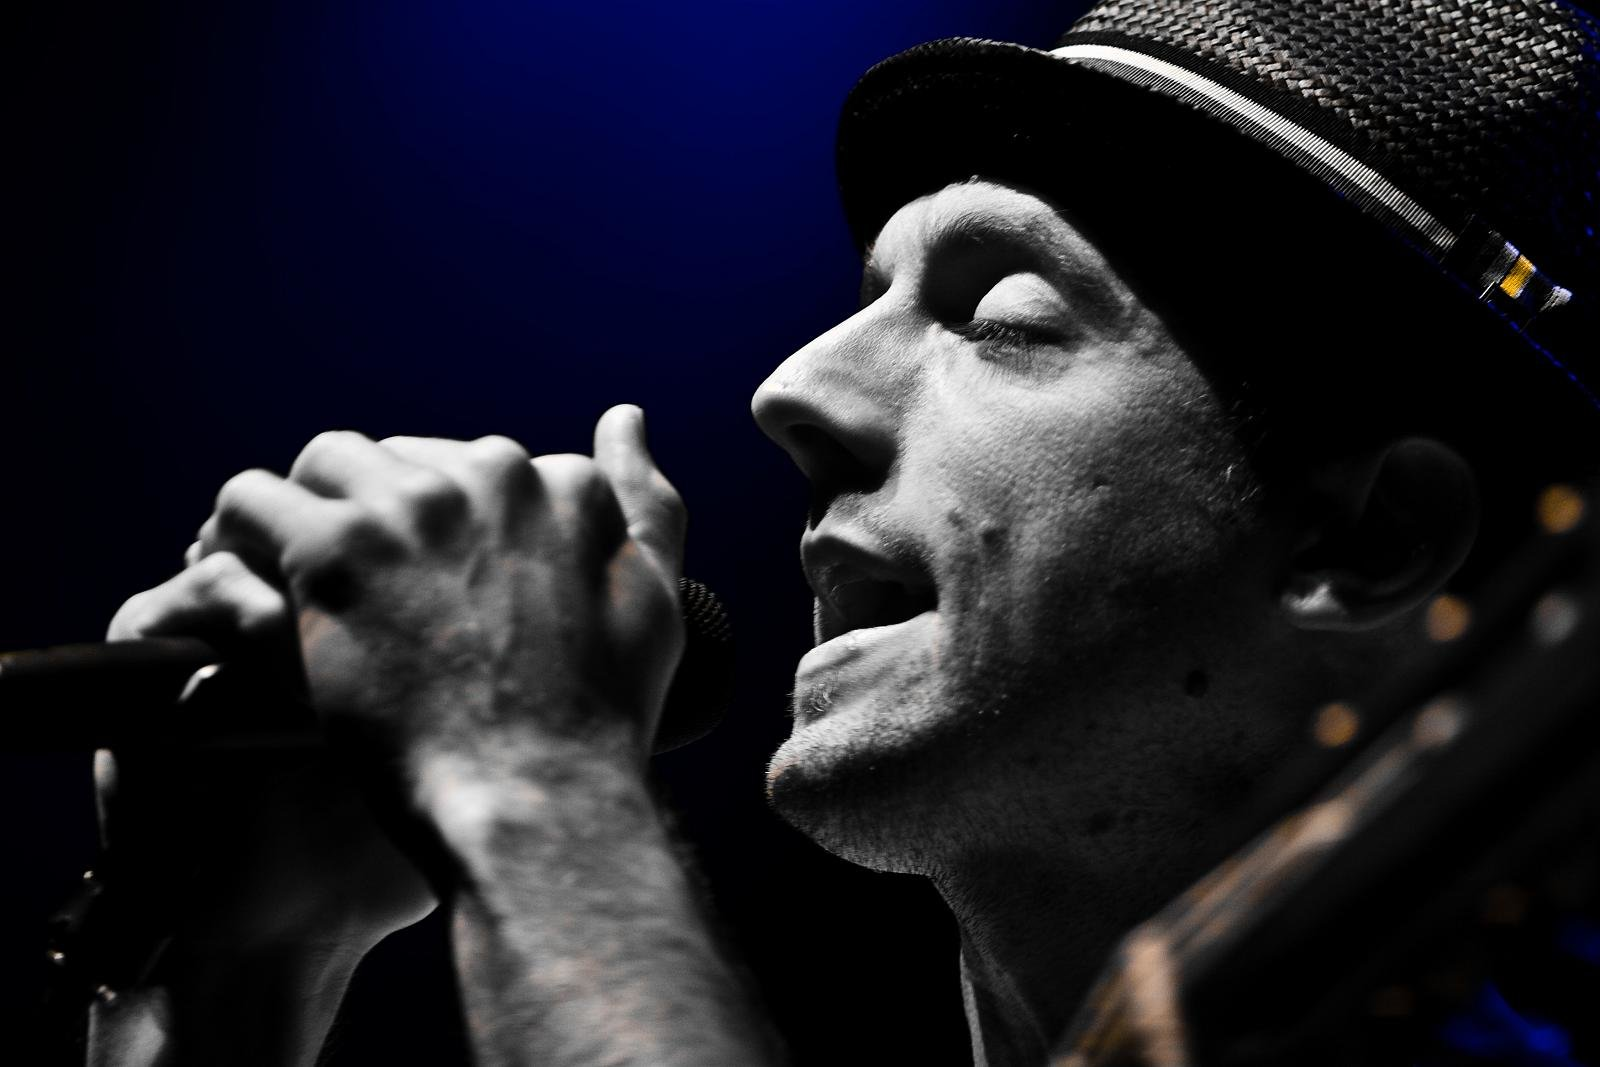 fred morledge; photofm; photofm.com; las vegas; concert photographer; photographer